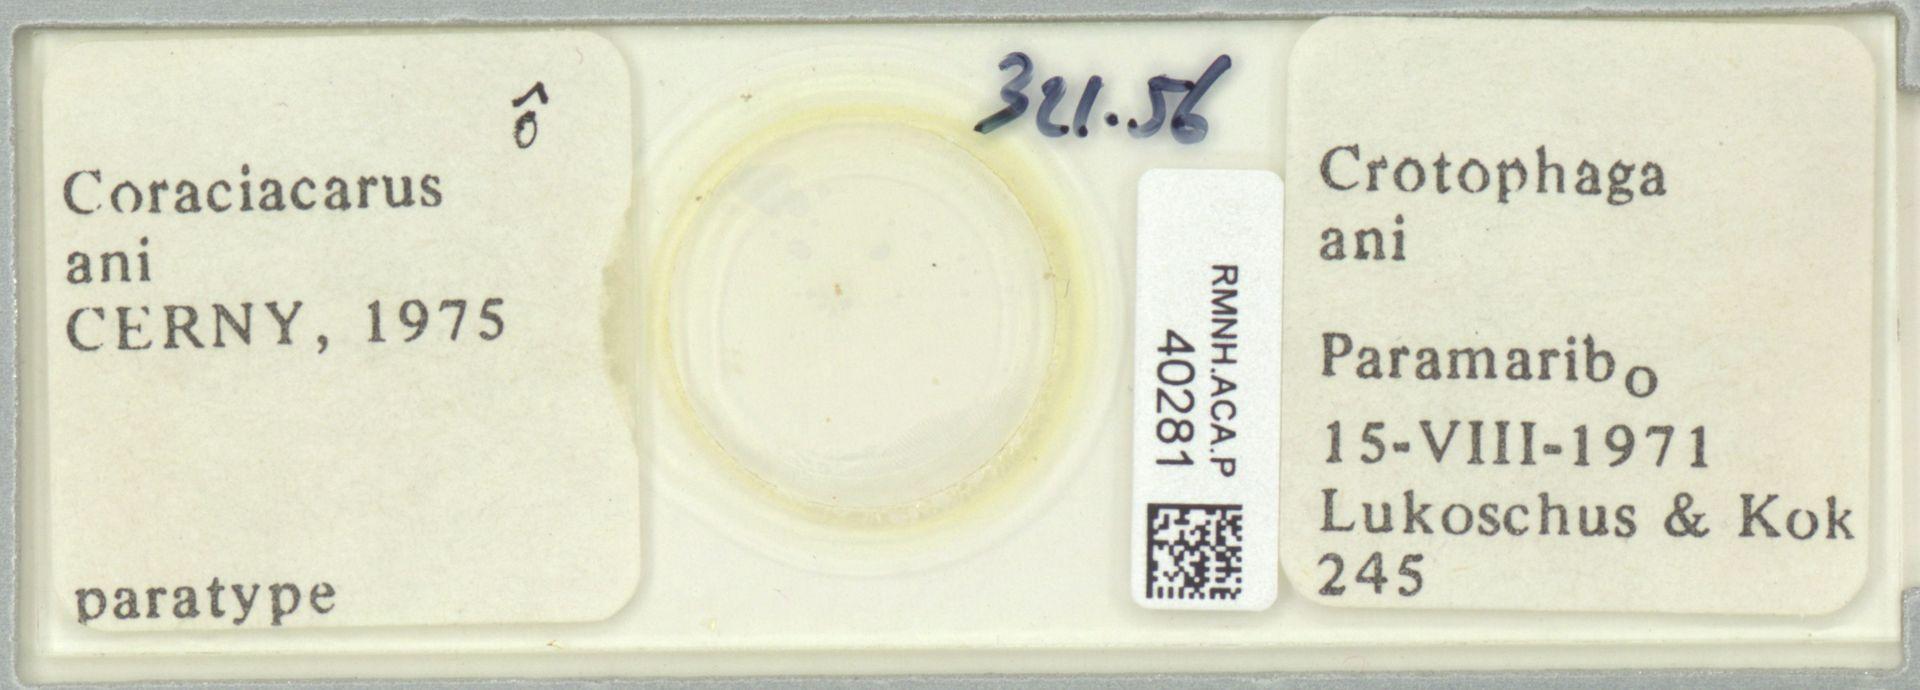 RMNH.ACA.P.40281 | Coraciacarus ani Cerny, 1975